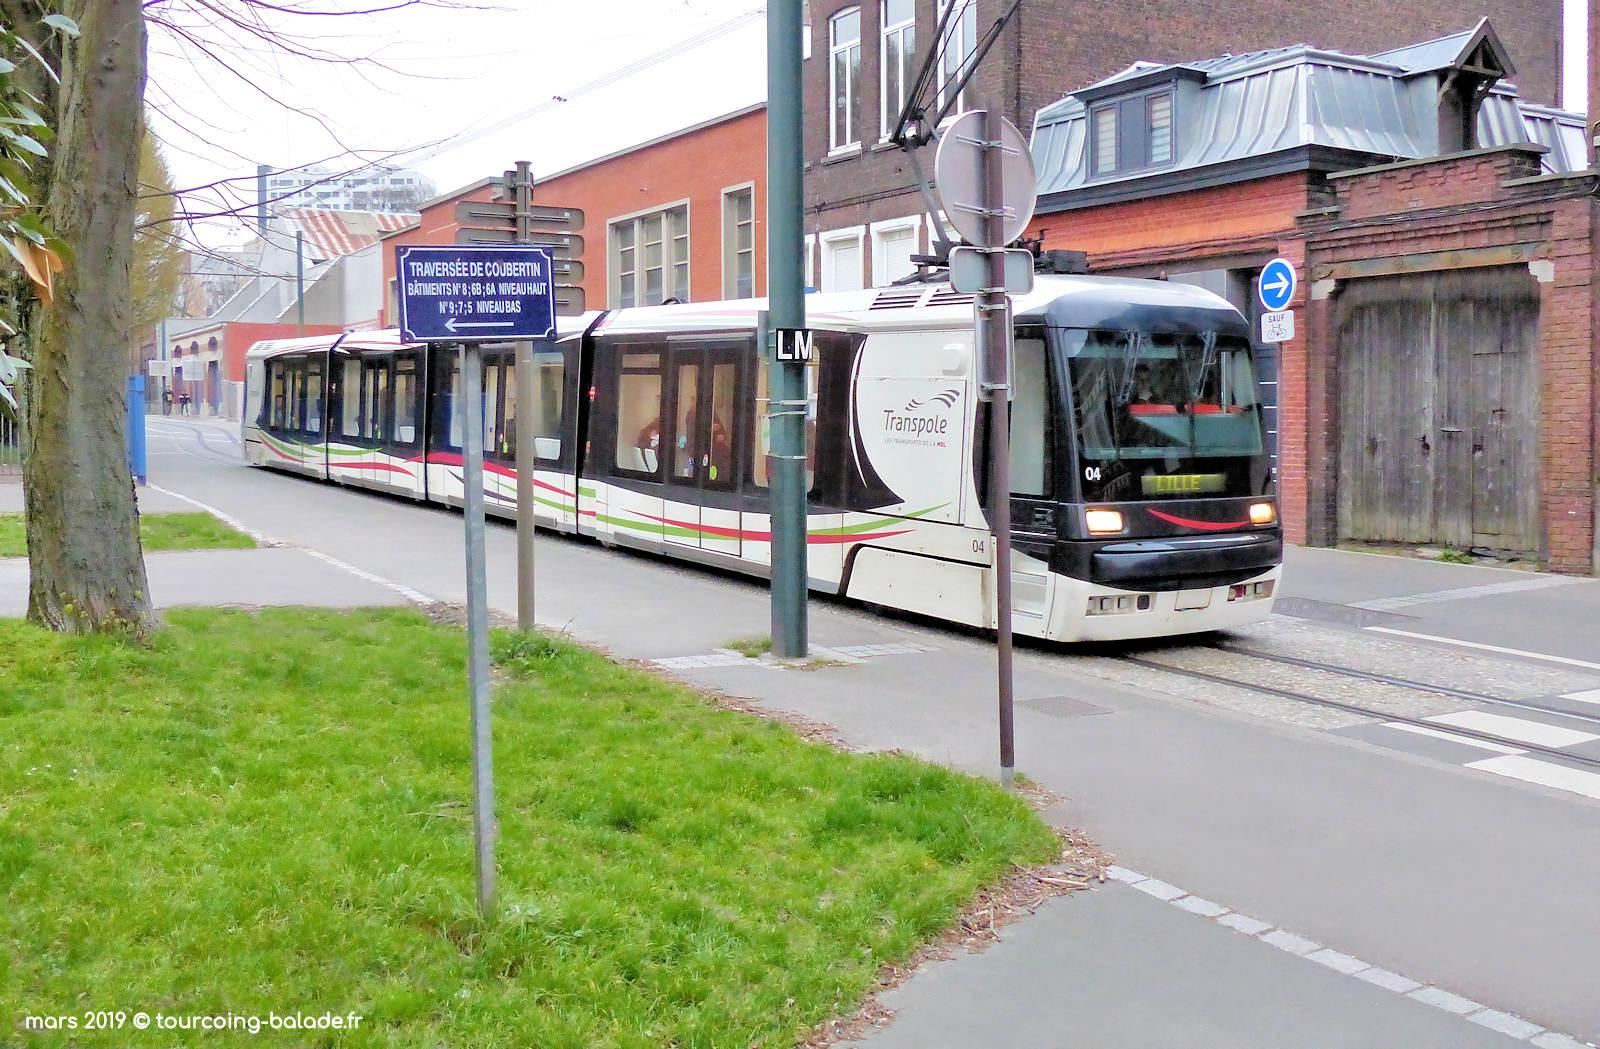 Rue Chanzy, Traverse Coubertin et Tramway - Tourcoing